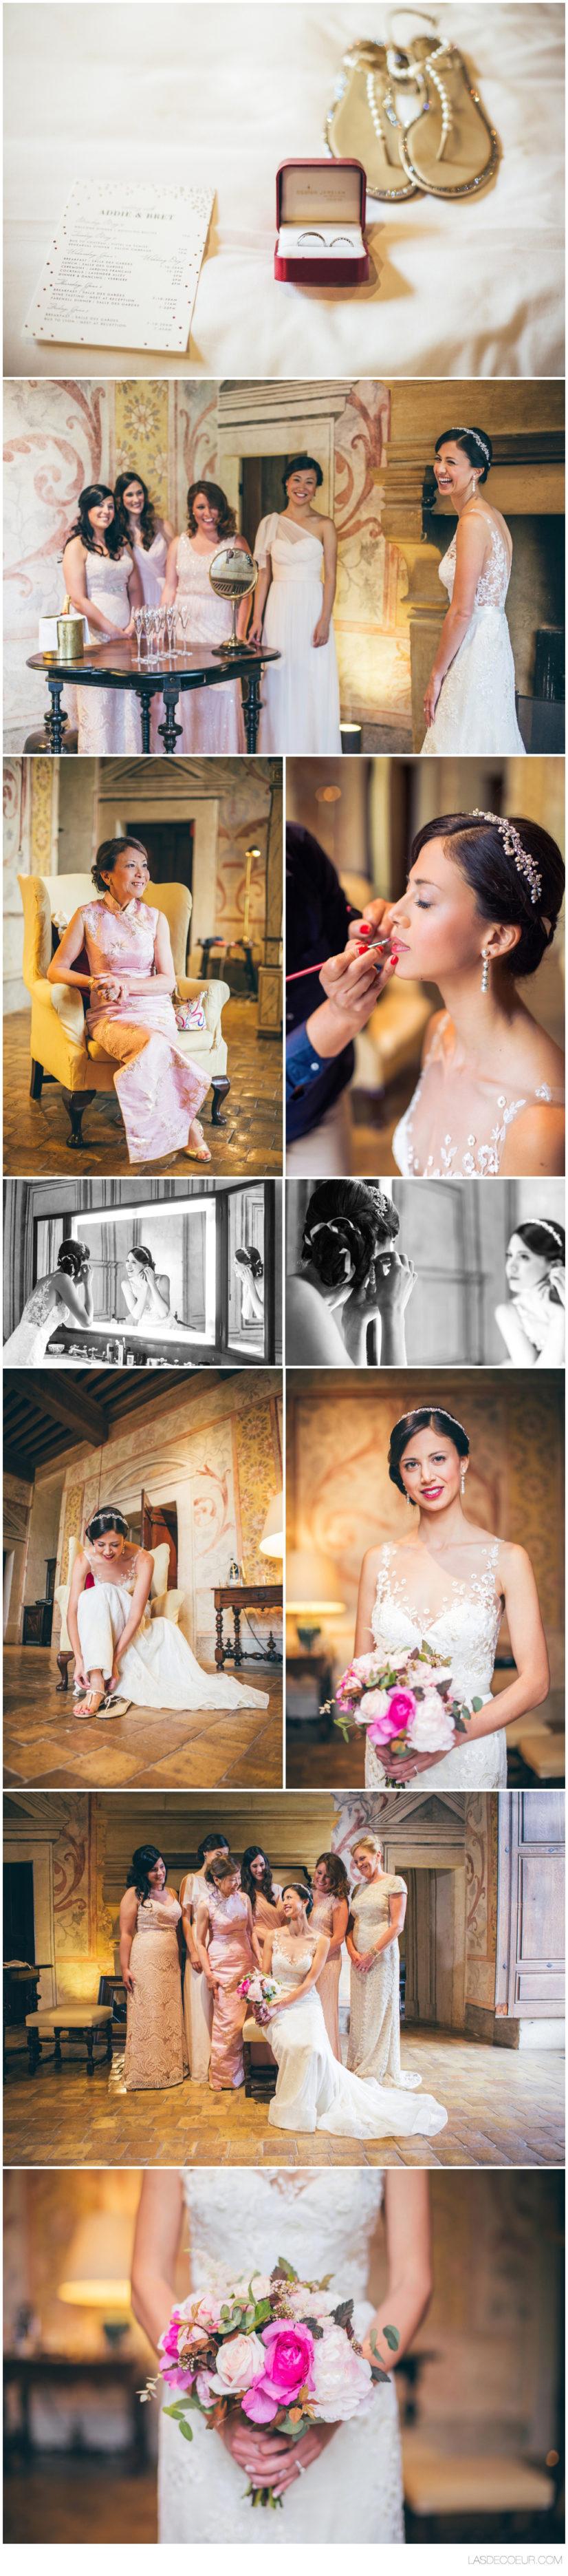 Photo mariage Chateau Bagnols 3